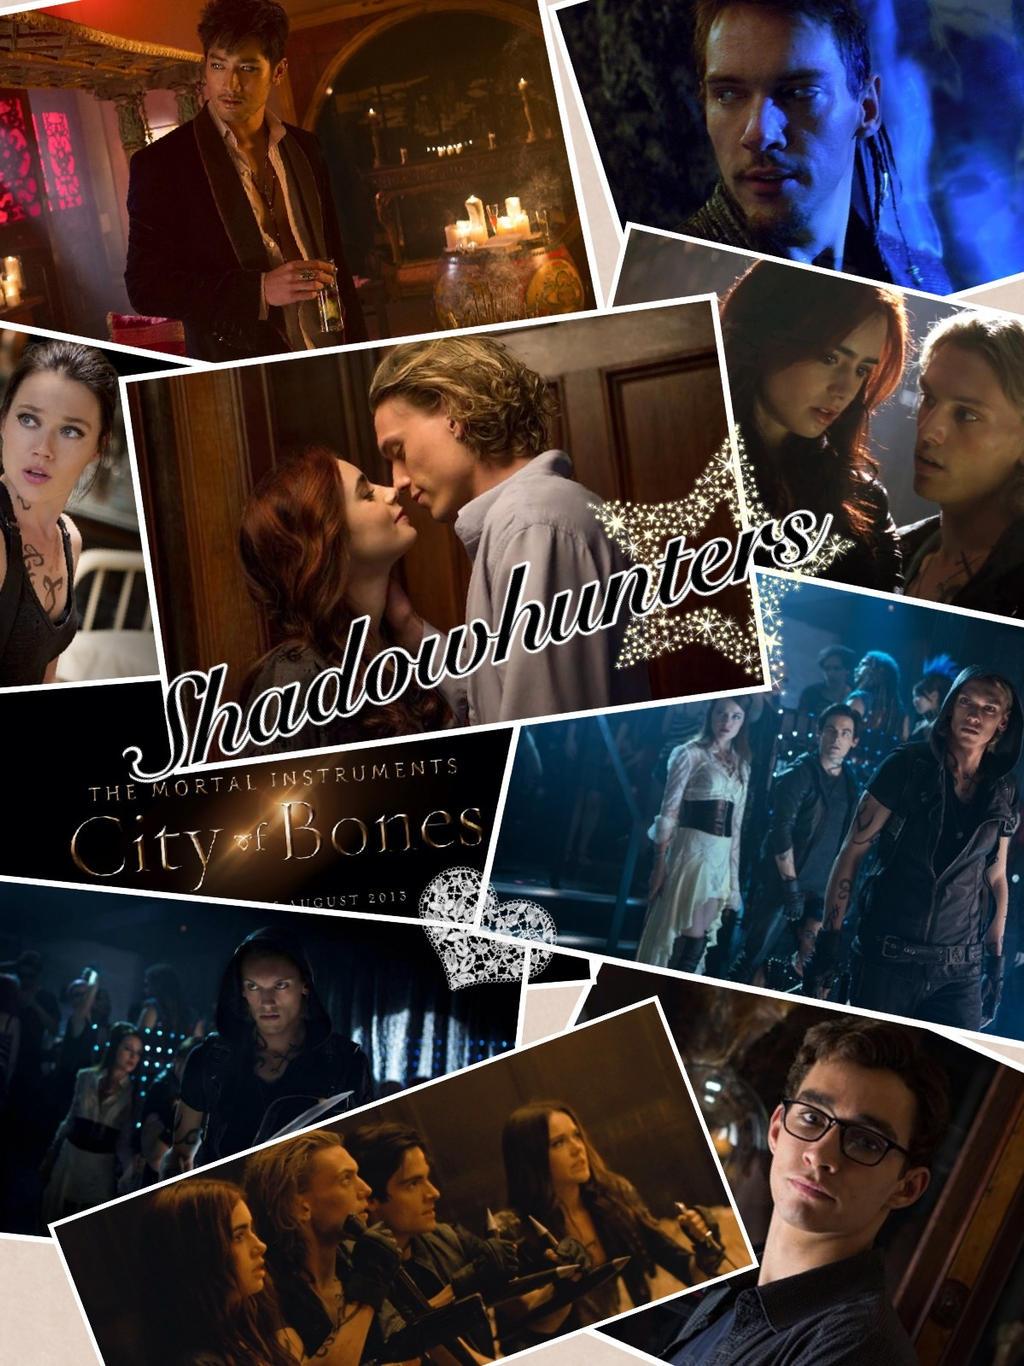 Wonderful Wallpaper Movie Collage - shadowhunters_city_of_bones_movie_collage_by_maryskatetwilight-d61tzez  Gallery_727755.jpg